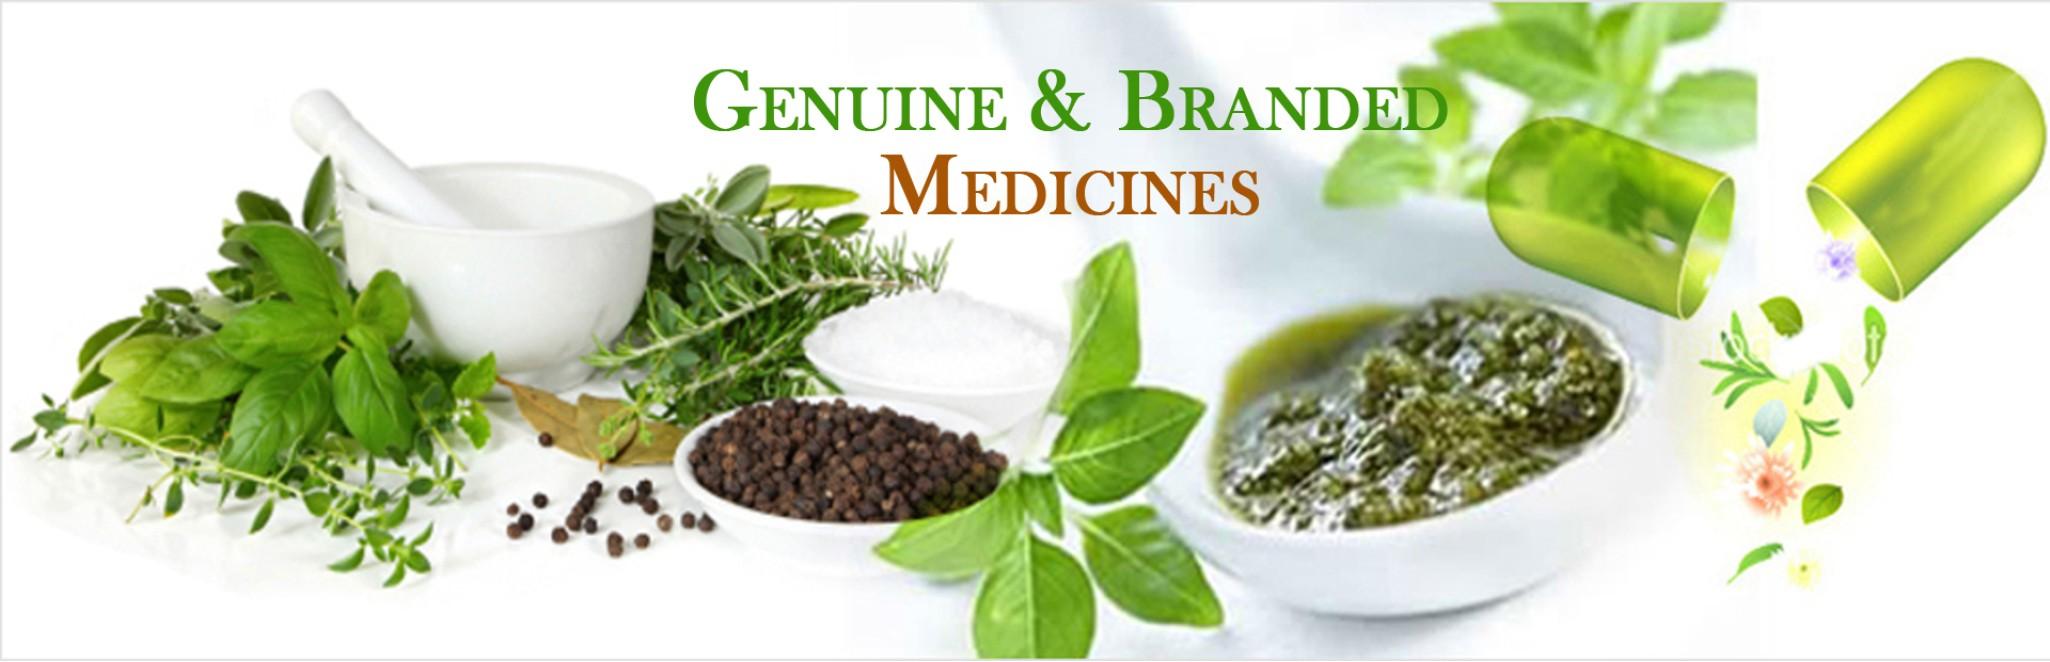 Genuine & Branded Medicines